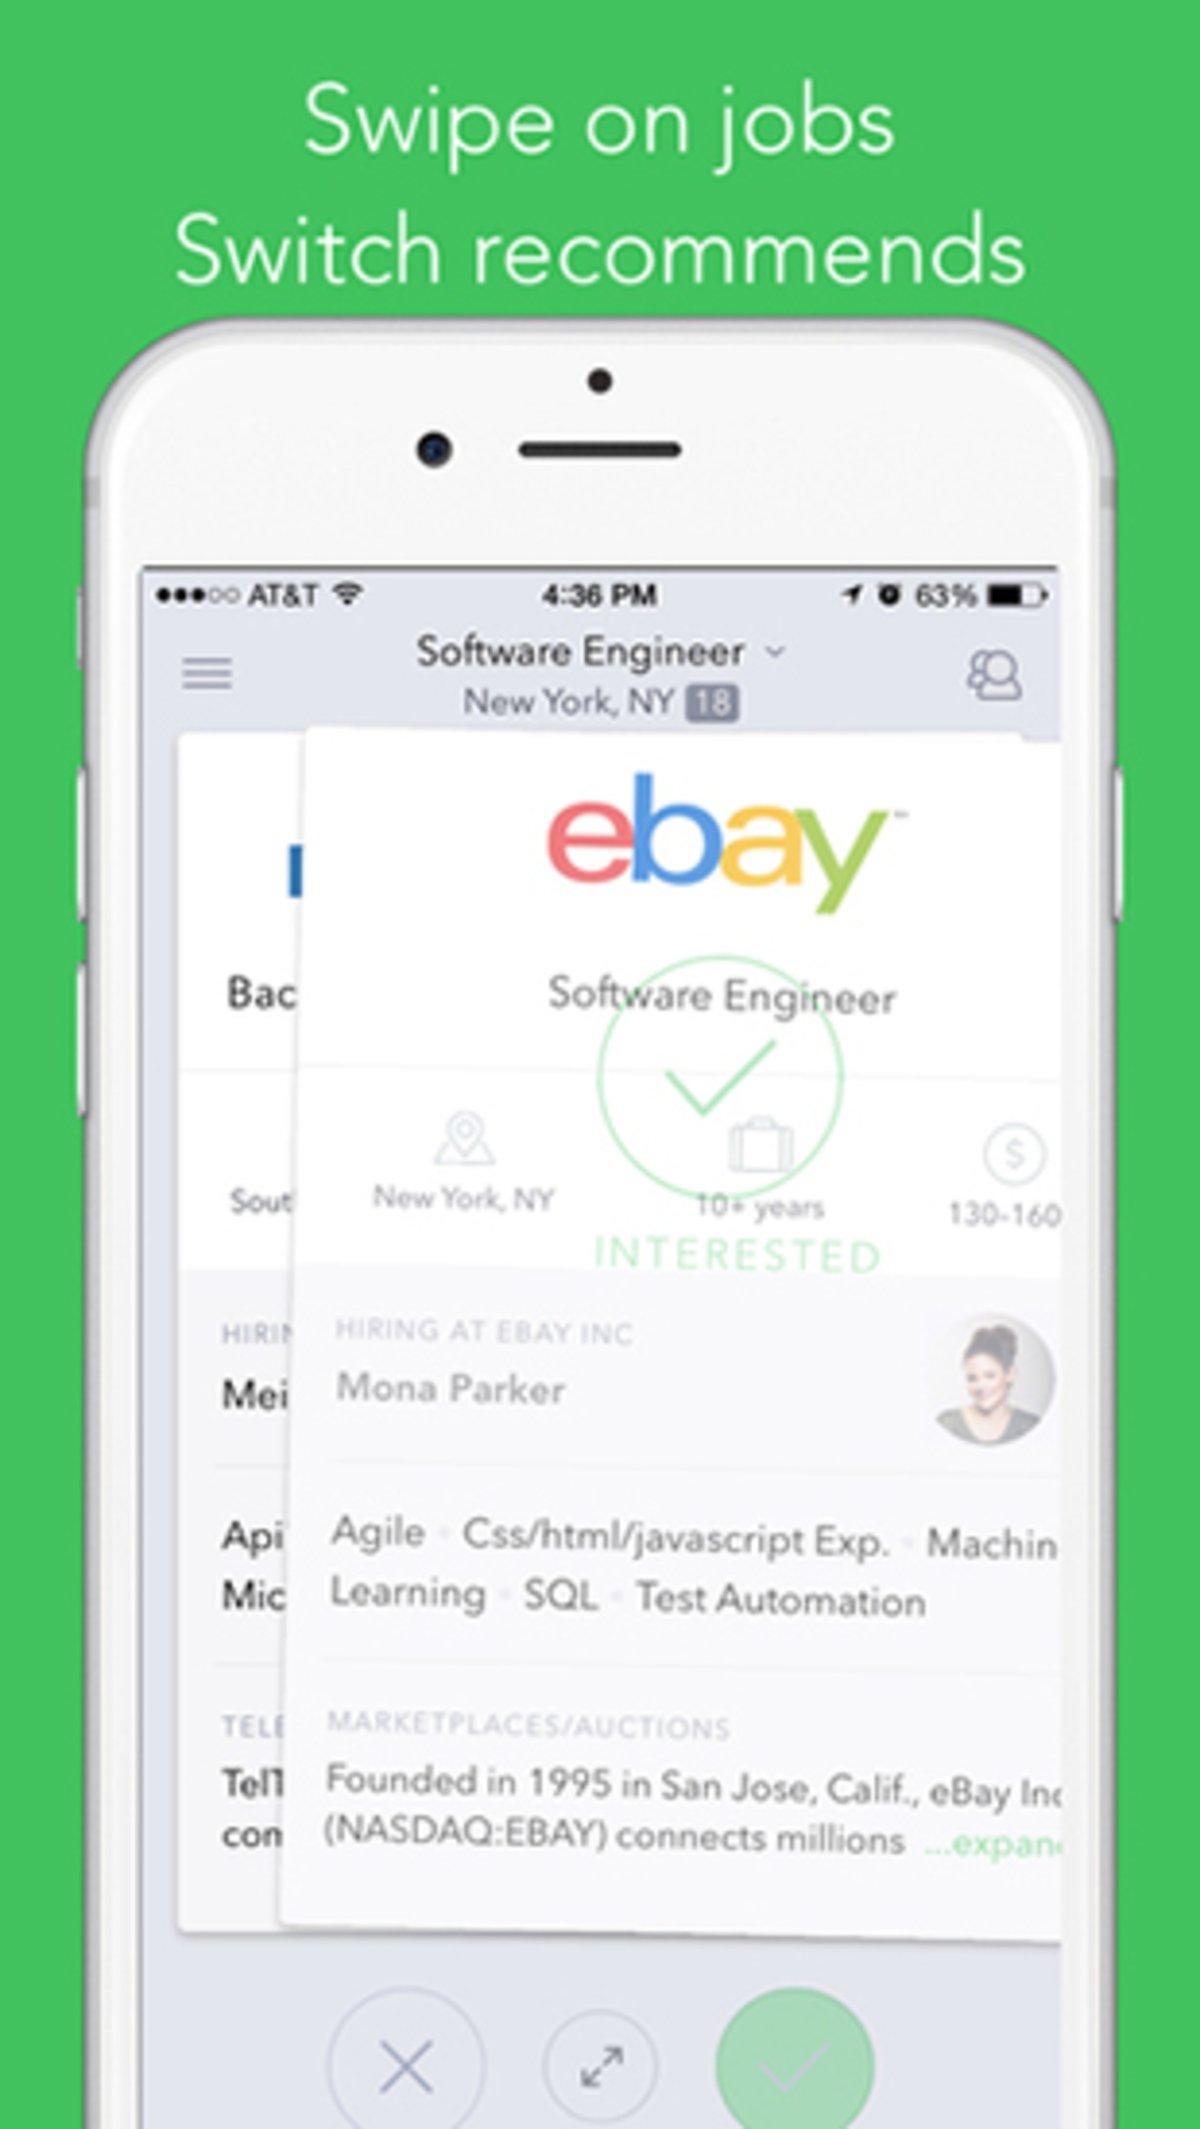 switch-app-buscar-trabajo-triunfa-eeuu-2